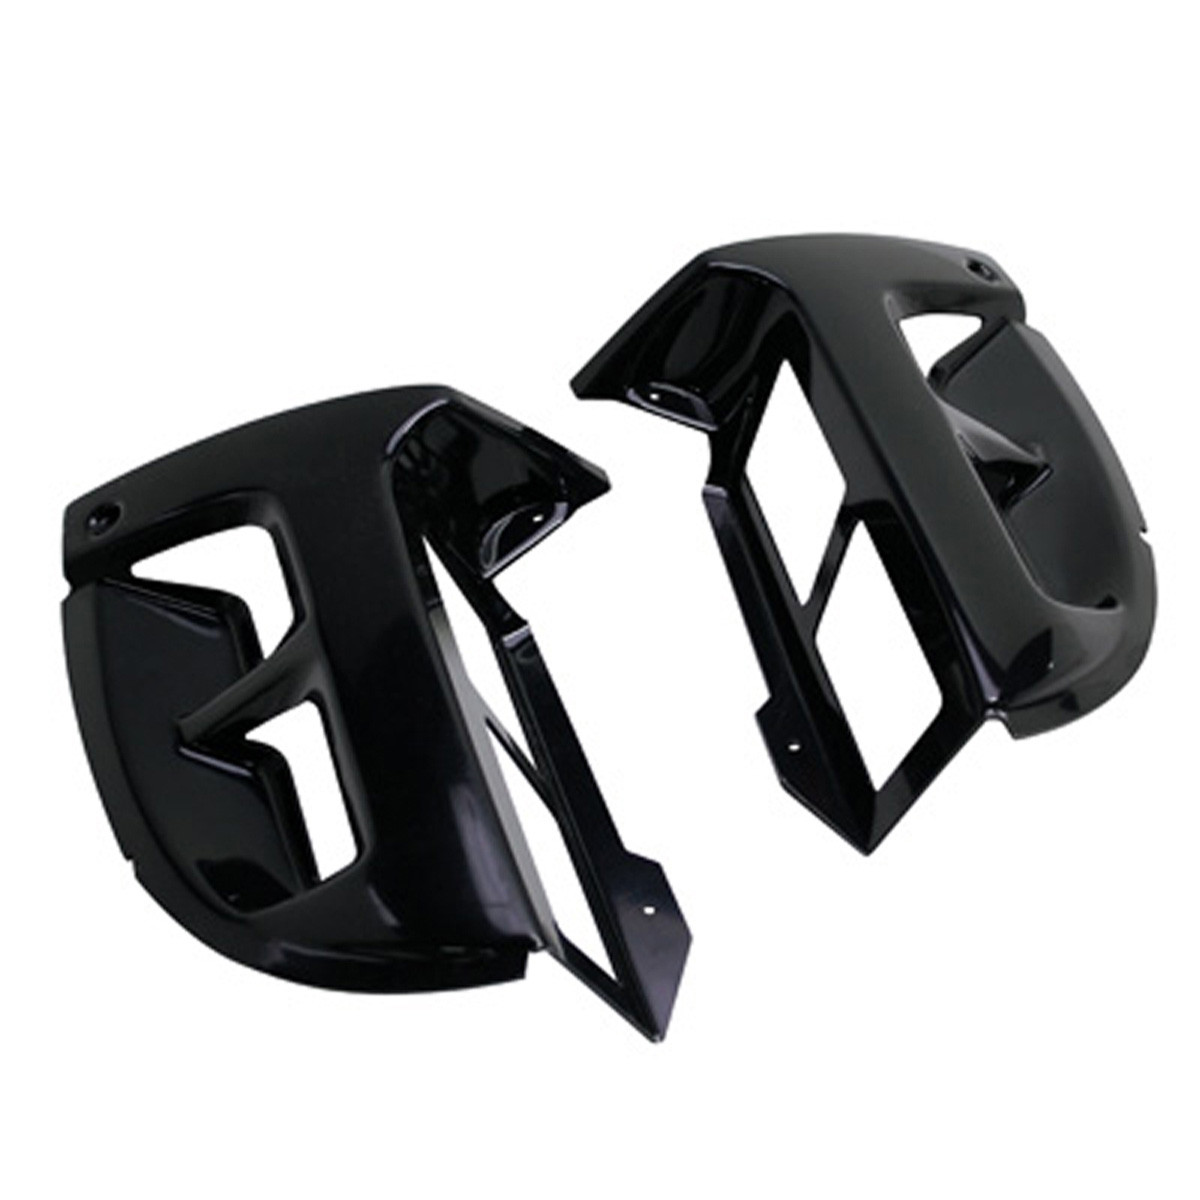 Ecopes PEUGEOT Ludix blaster - BCD Noir